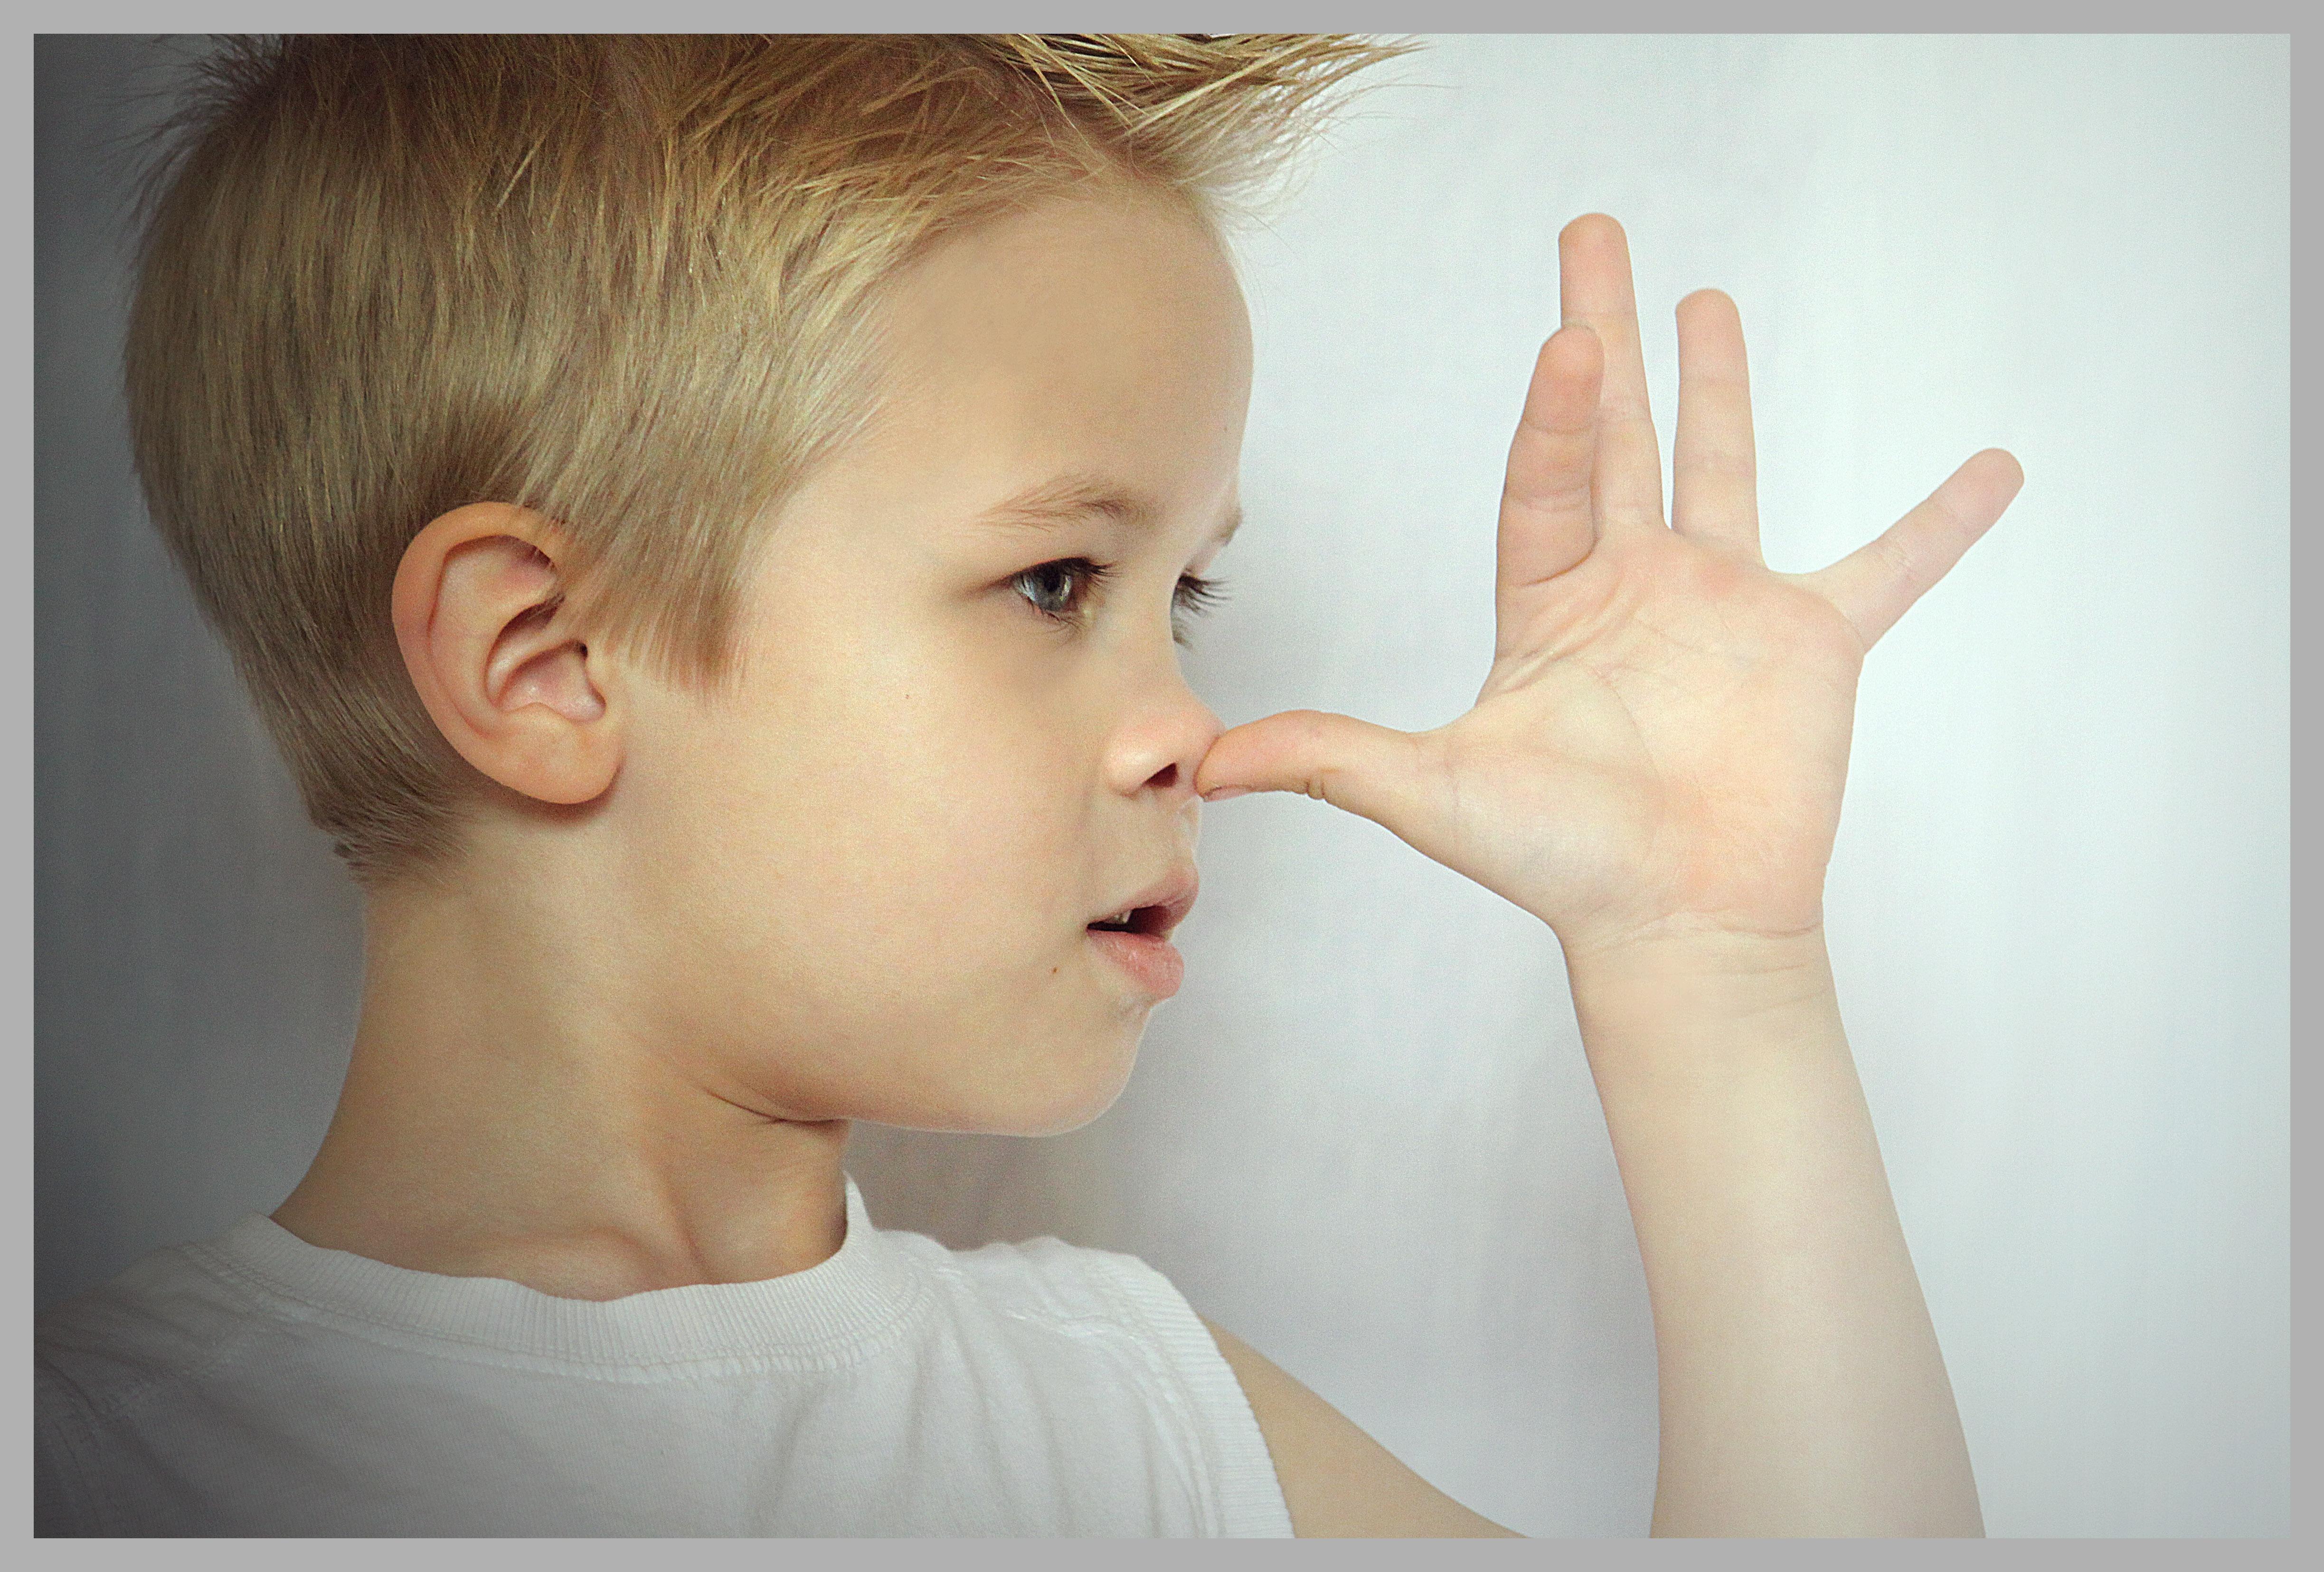 Kostenlose Foto Hand Person Fotografie Junge Portrat Finger